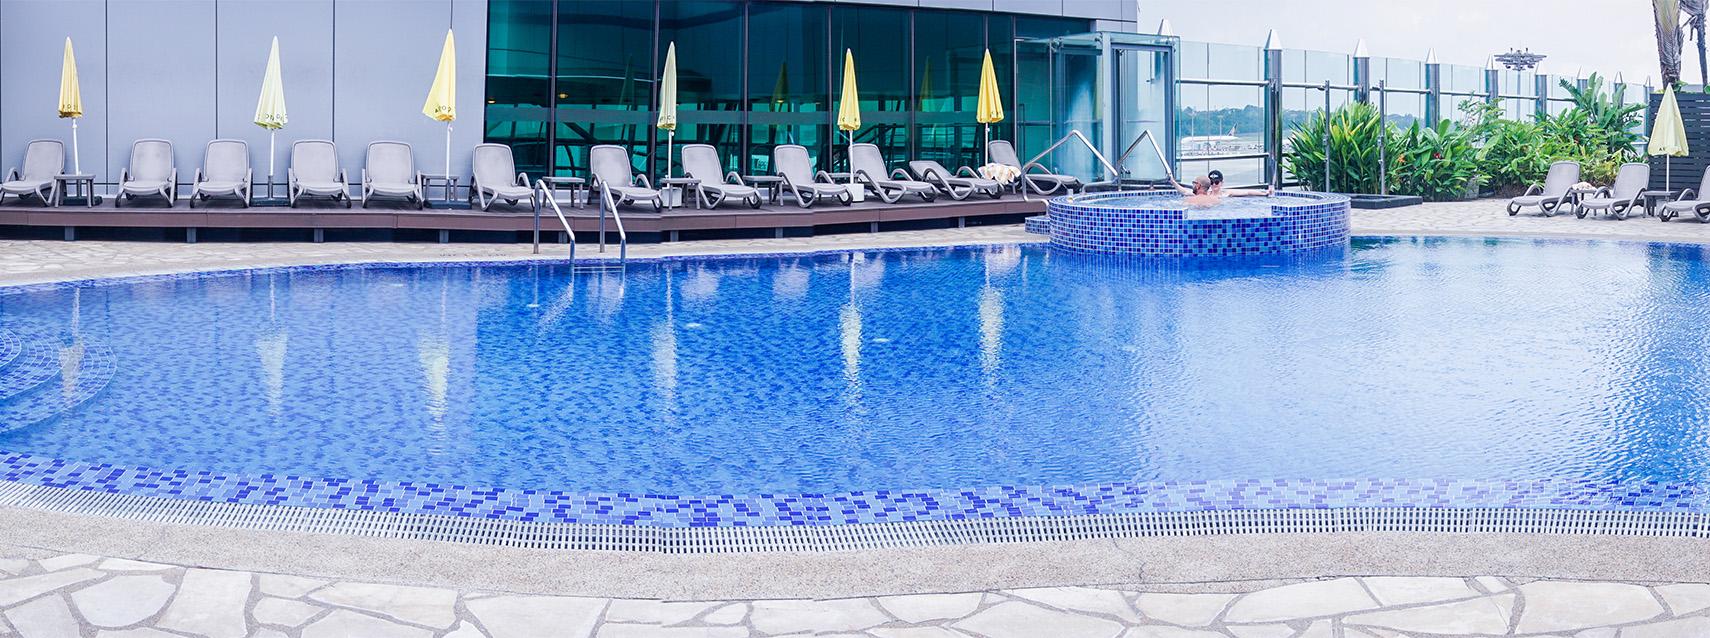 Swimming Pool | Singapore Changi Airport